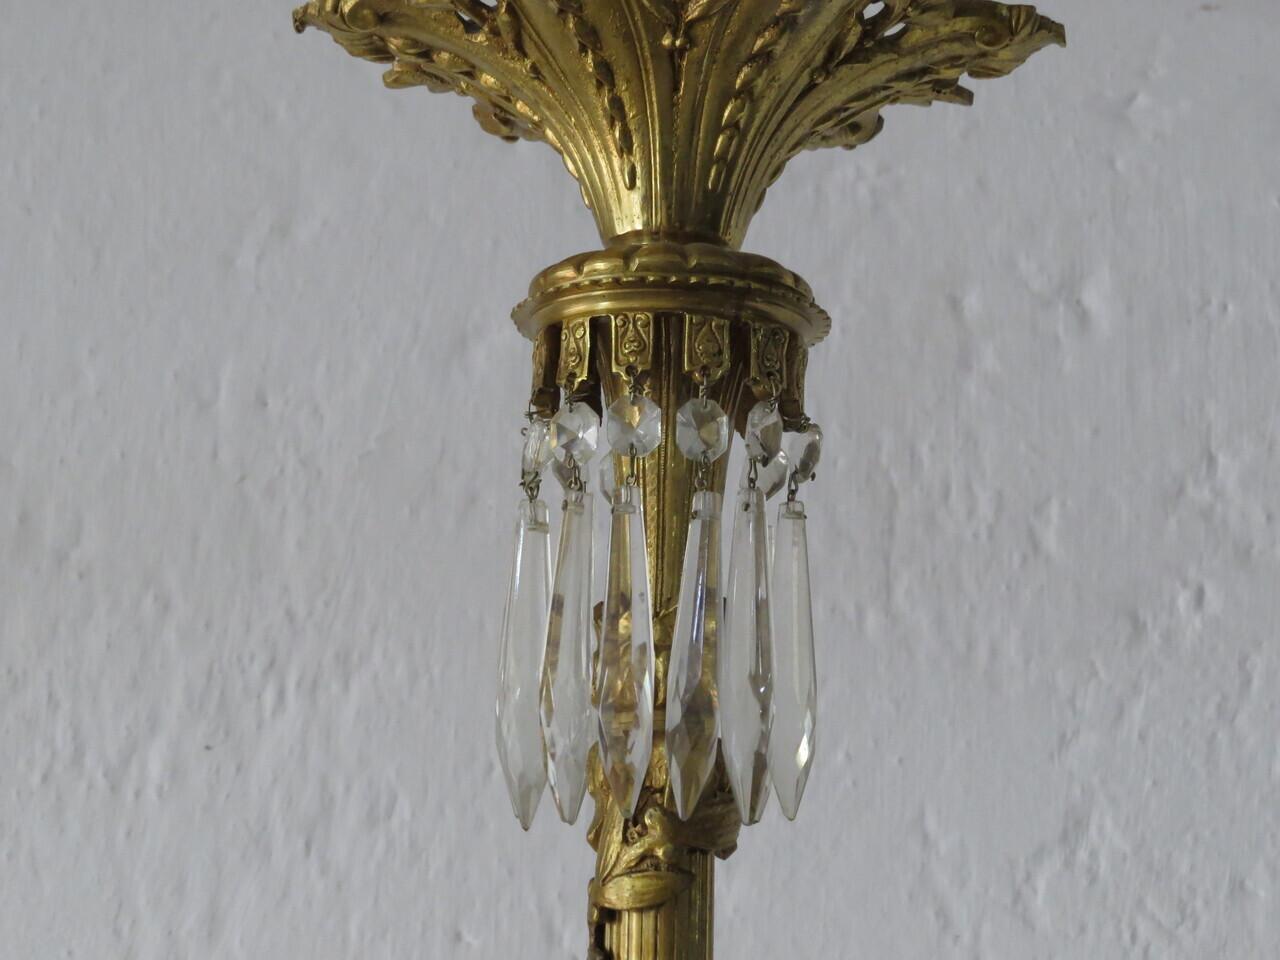 Lote: 88 - Lote: 88 - Araña francesa 6 hojas Luis XVI